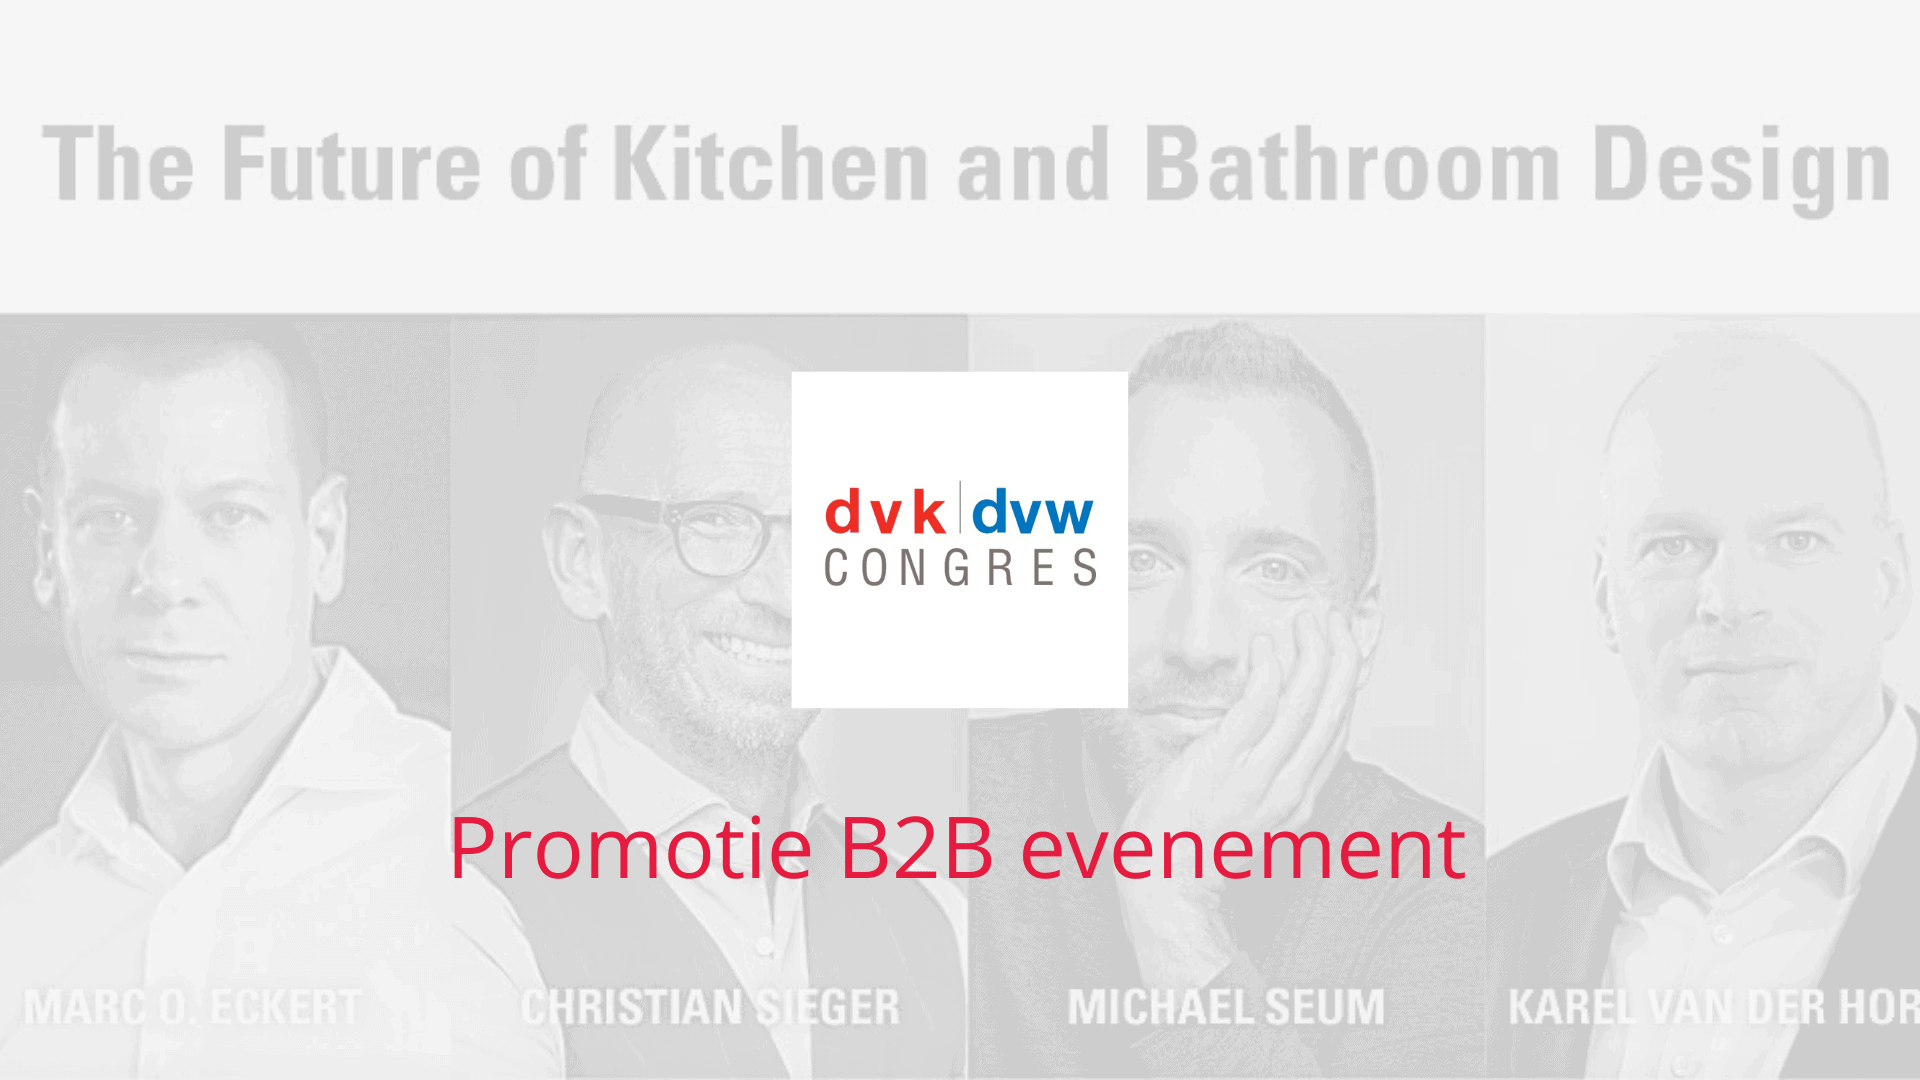 B2B evenement promoten